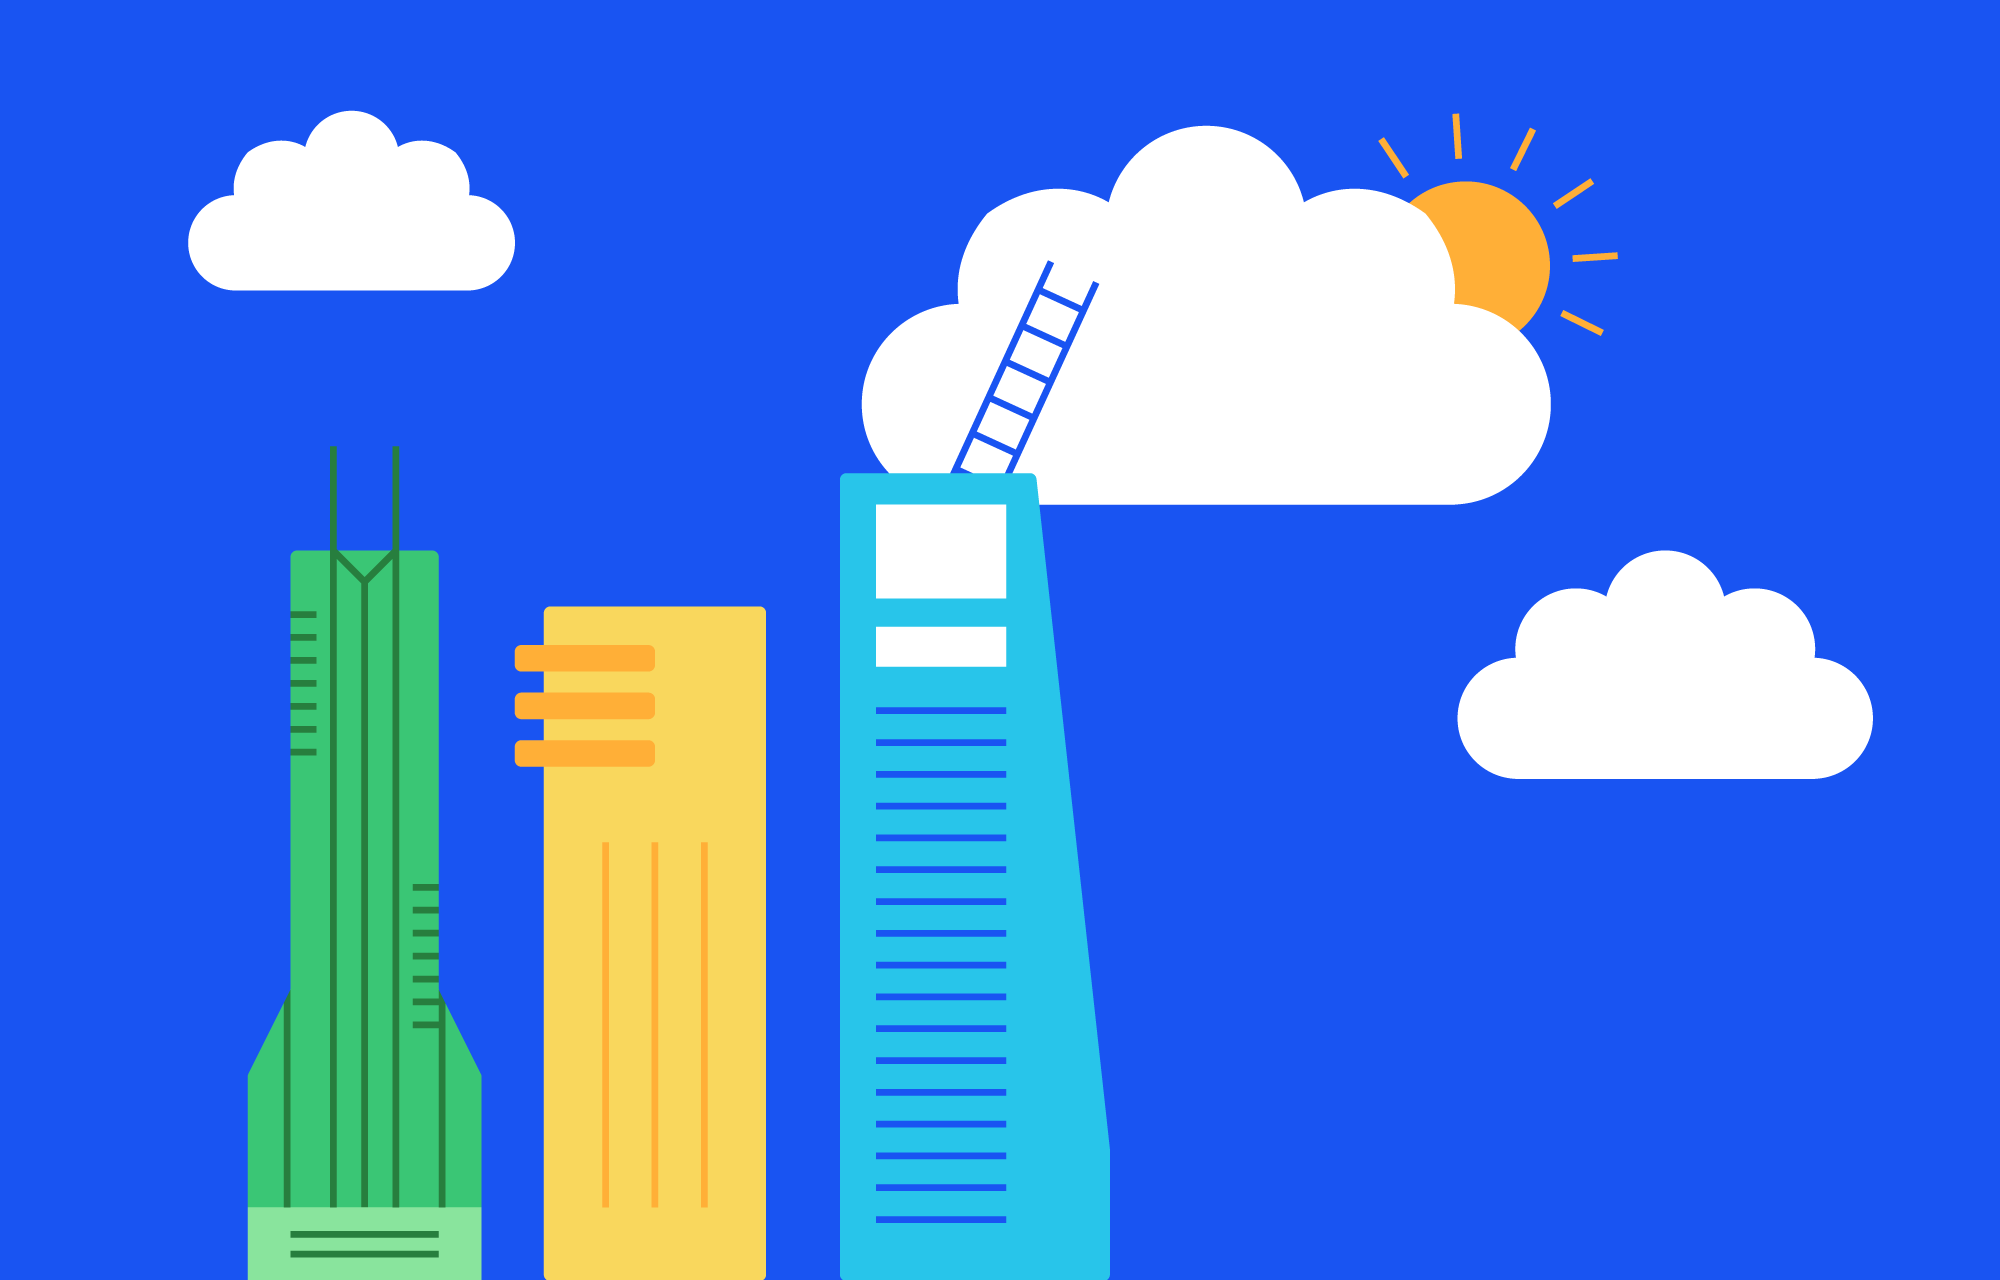 Tre skyskrapere foran en blå himmel med skyer og sol.